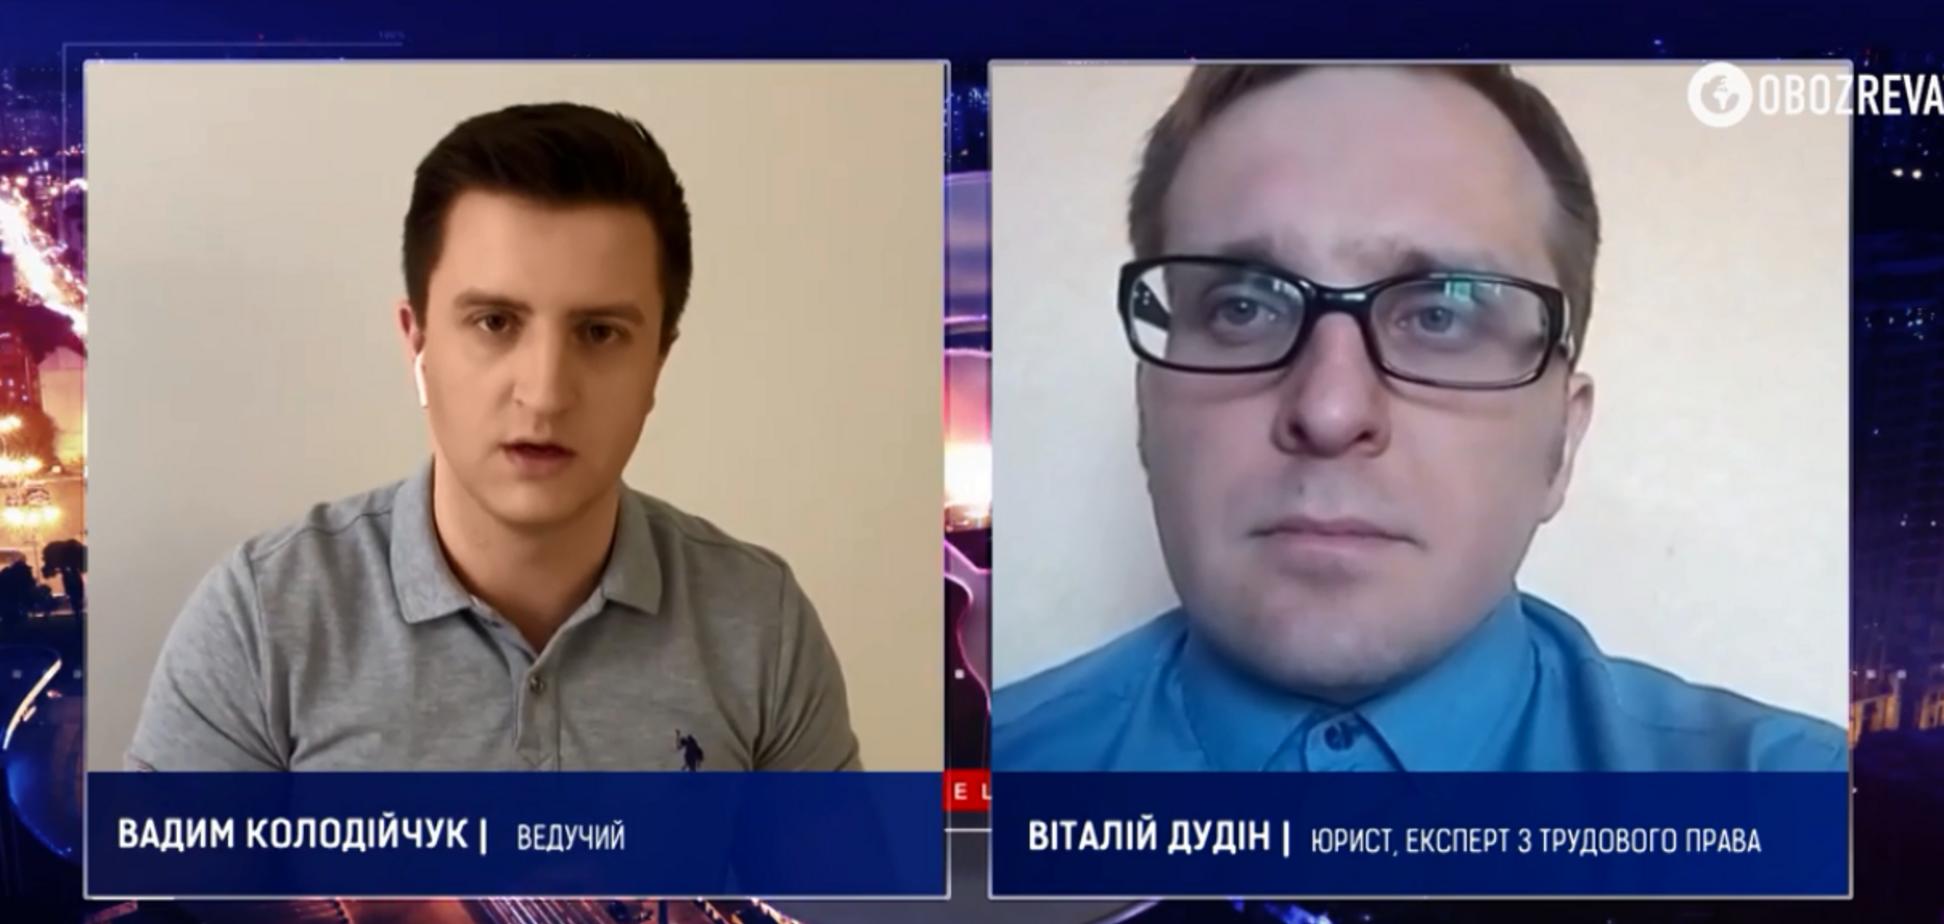 Увольнения и отпуска из-за карантина: юрист дал советы украинцам